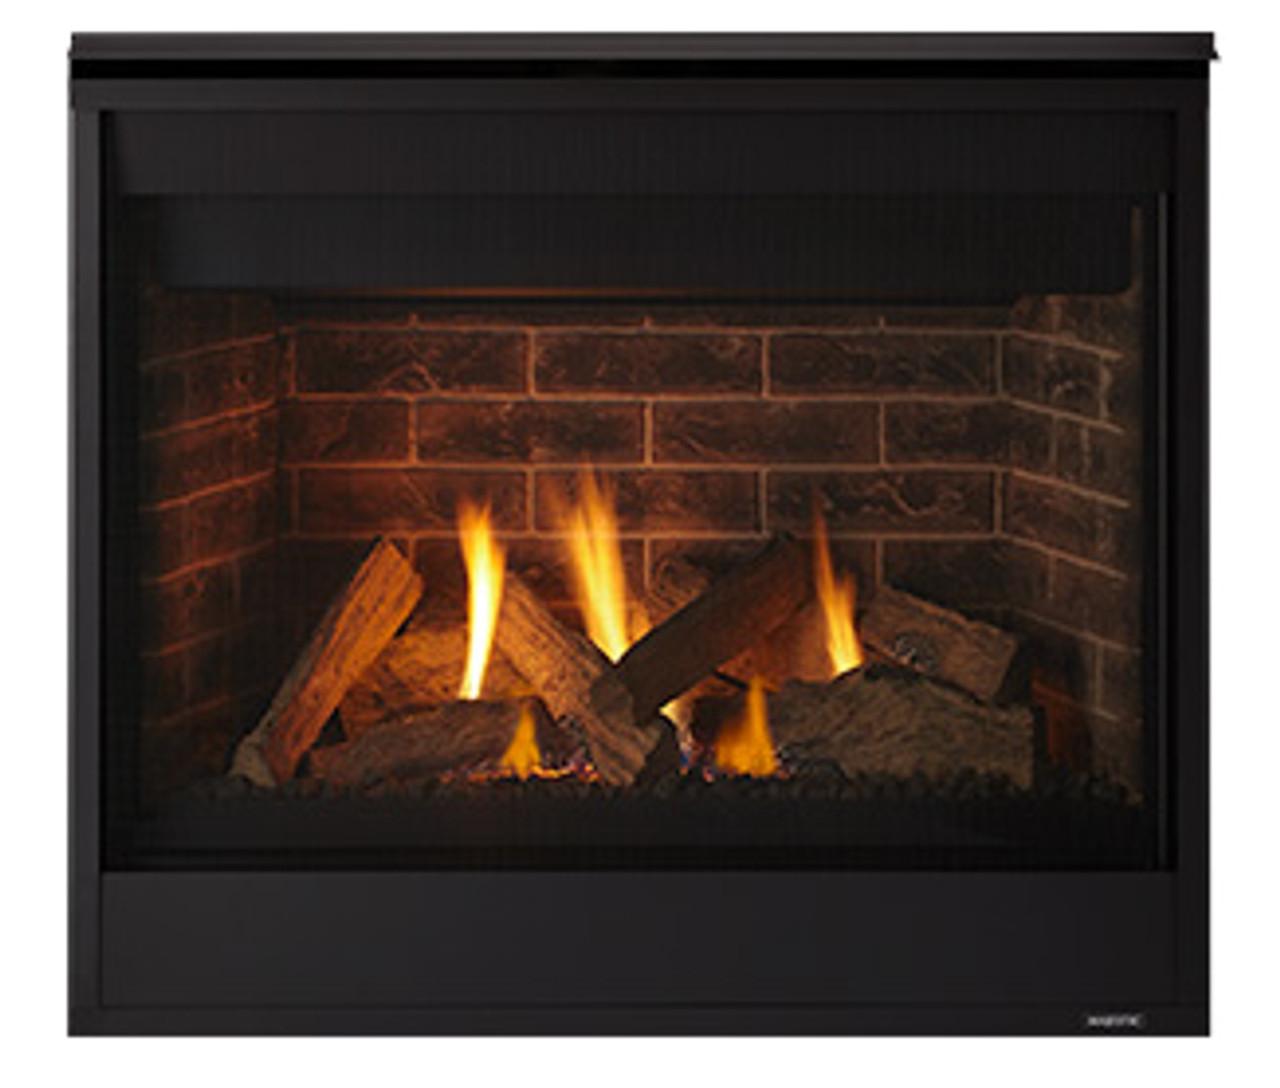 Remarkable Majestic Quartz 36 Gas Fireplace Beutiful Home Inspiration Ommitmahrainfo